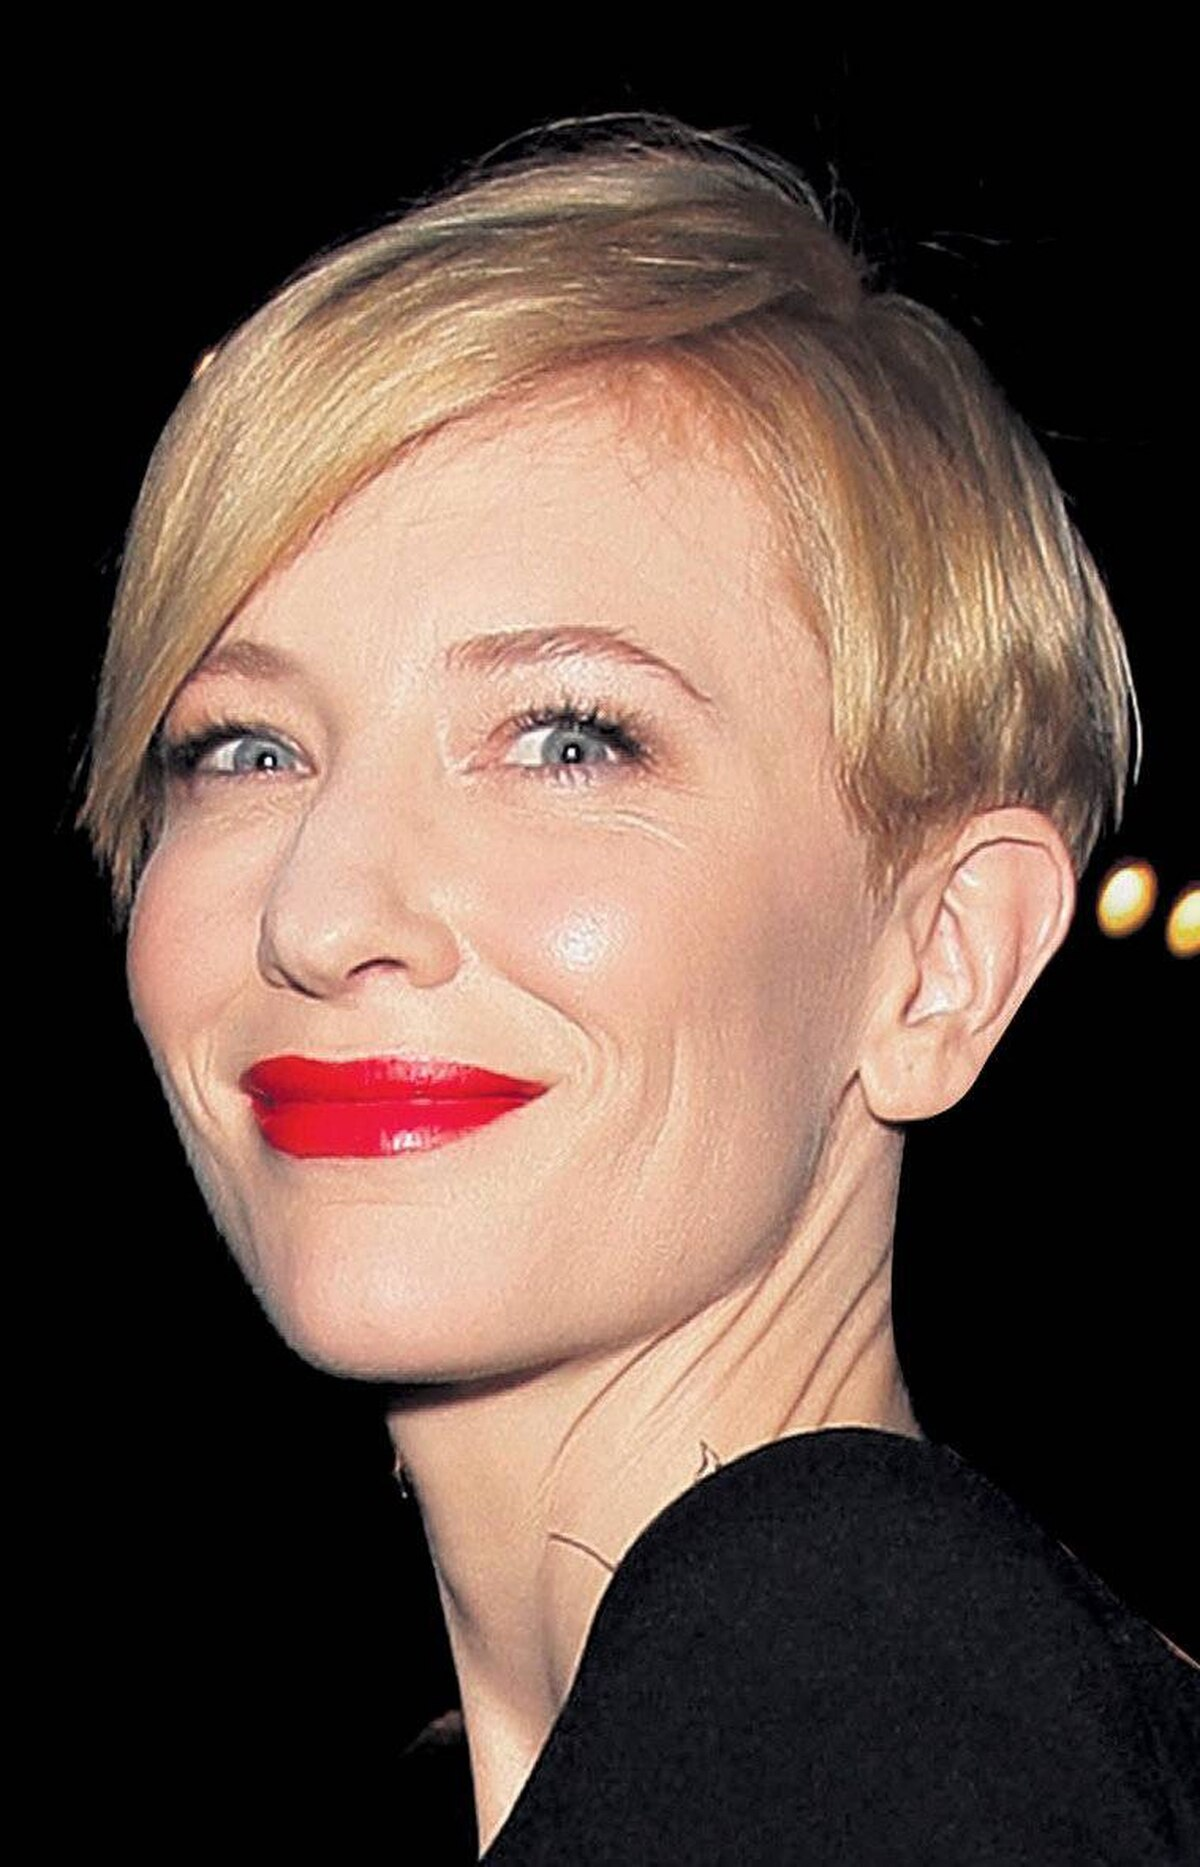 Cate Blanchett: Rich ruby